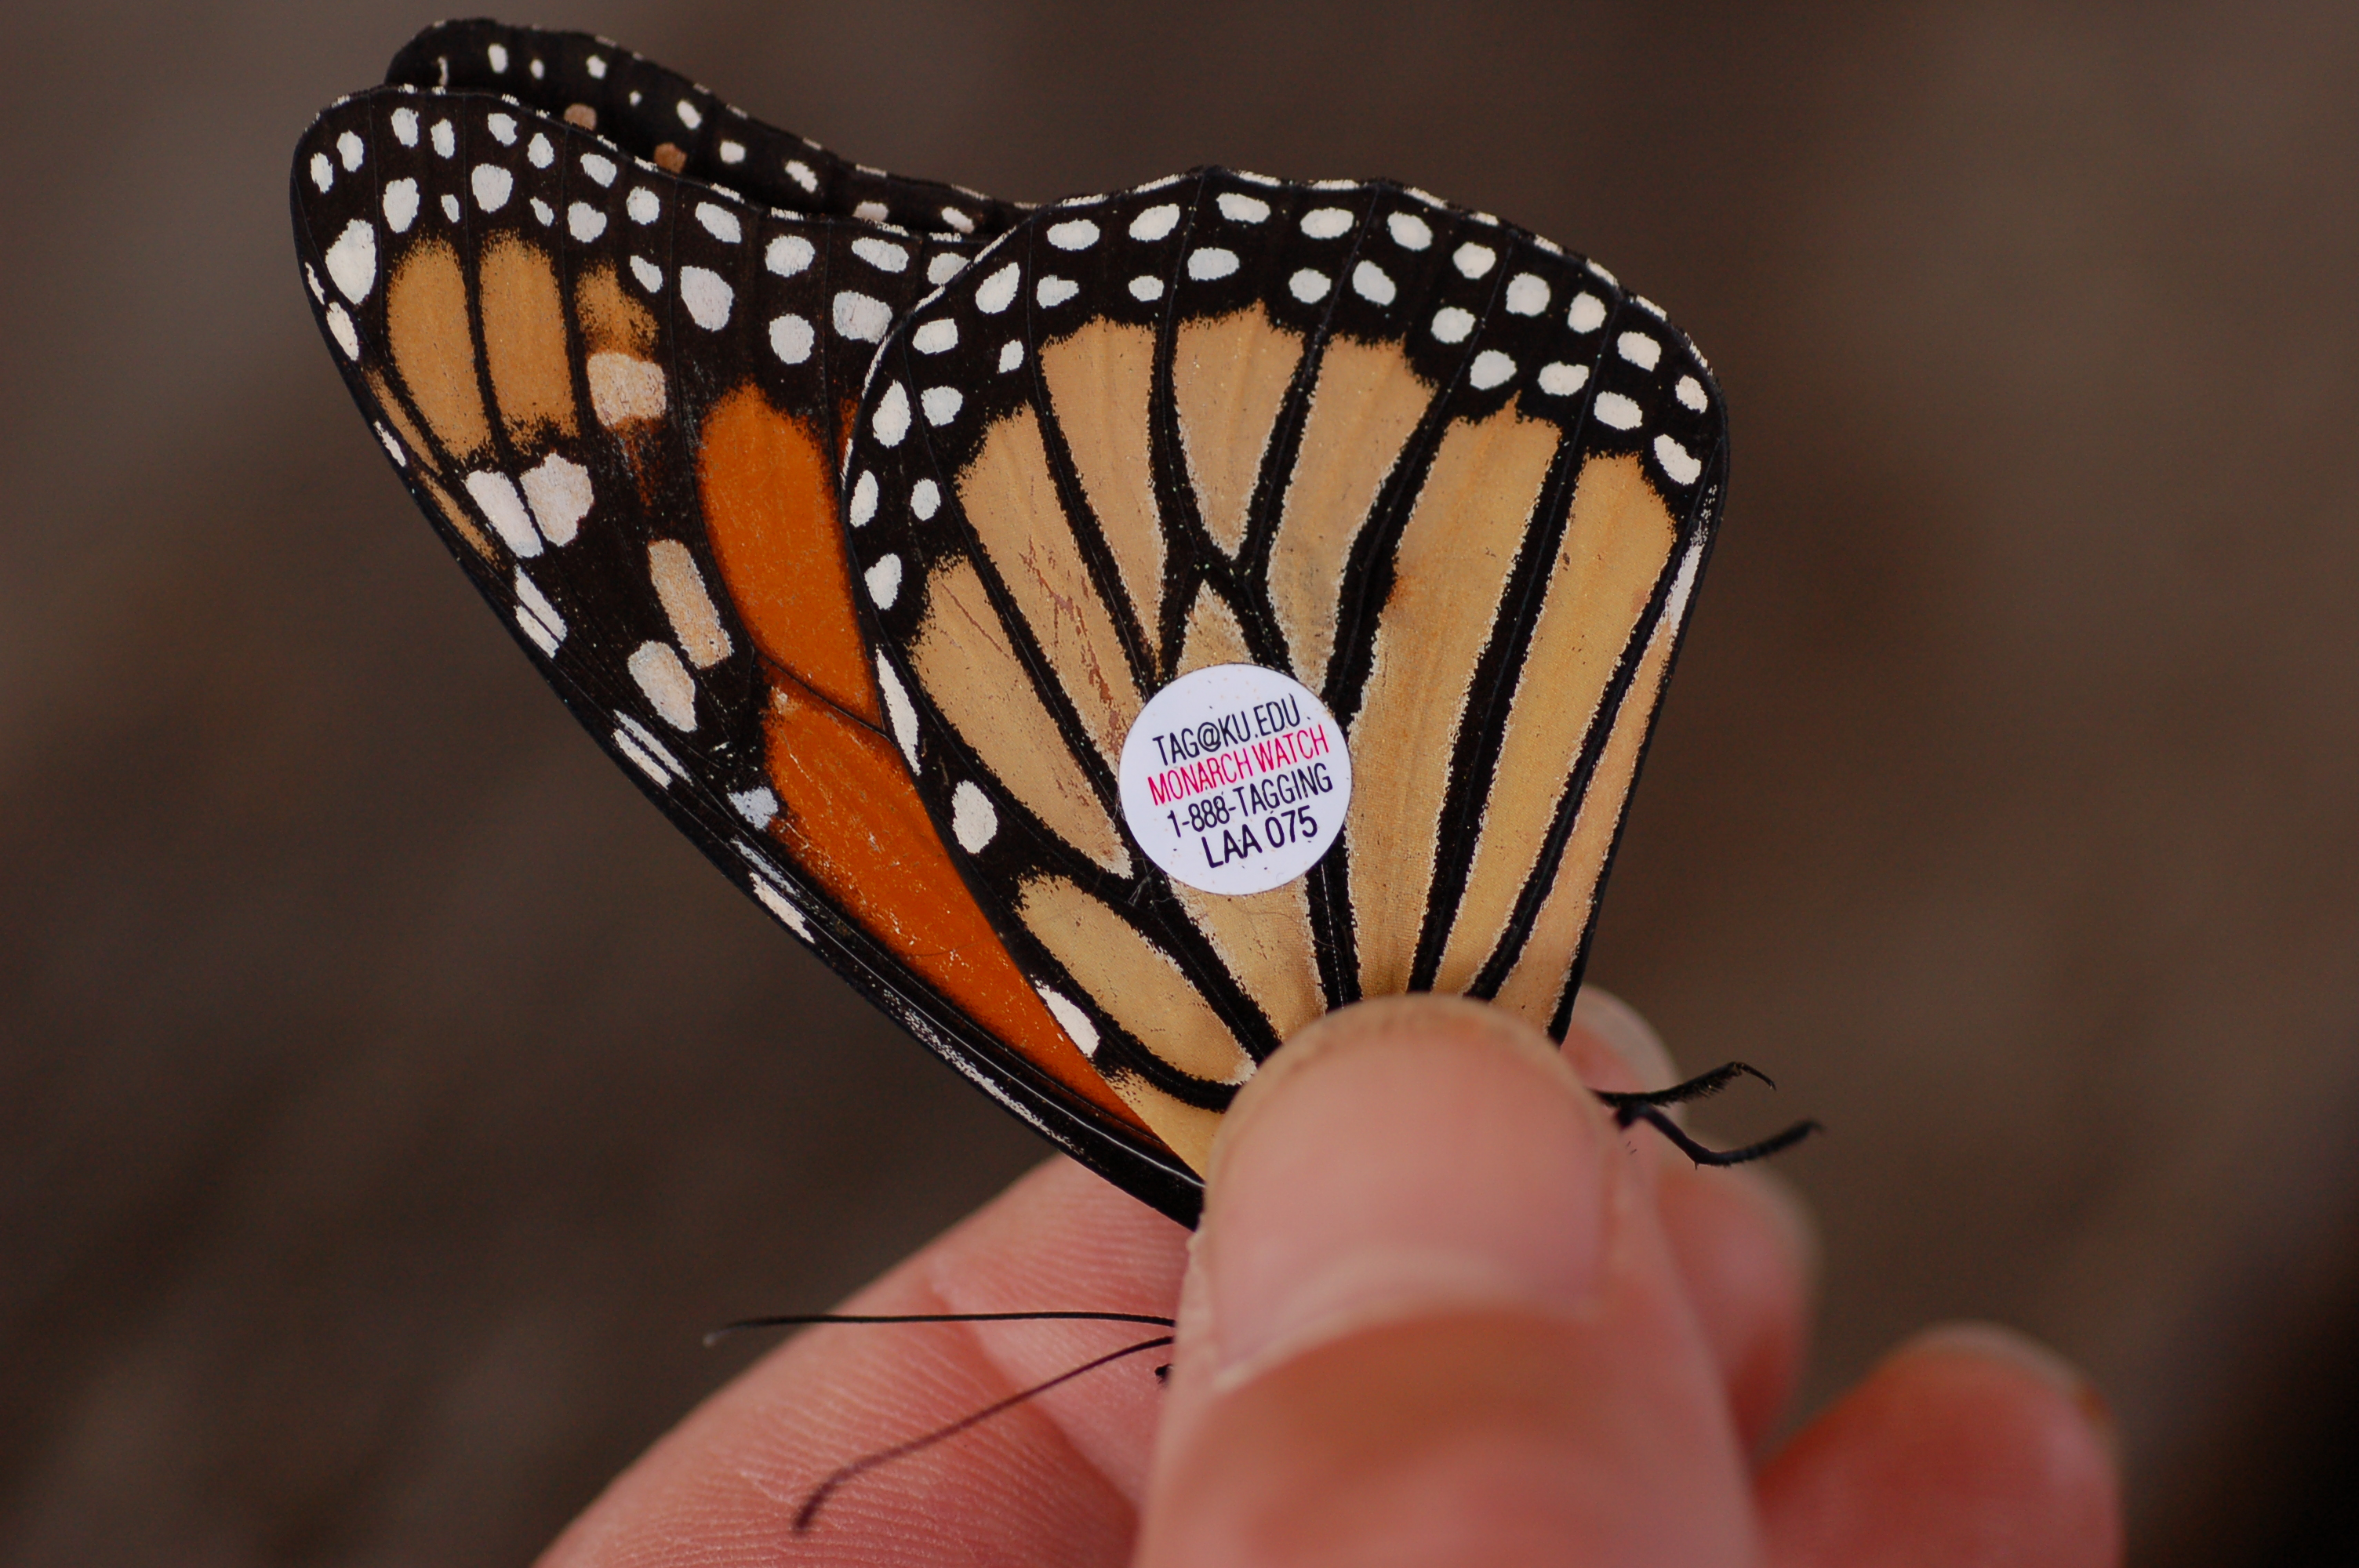 Monarch butterfly body - photo#4